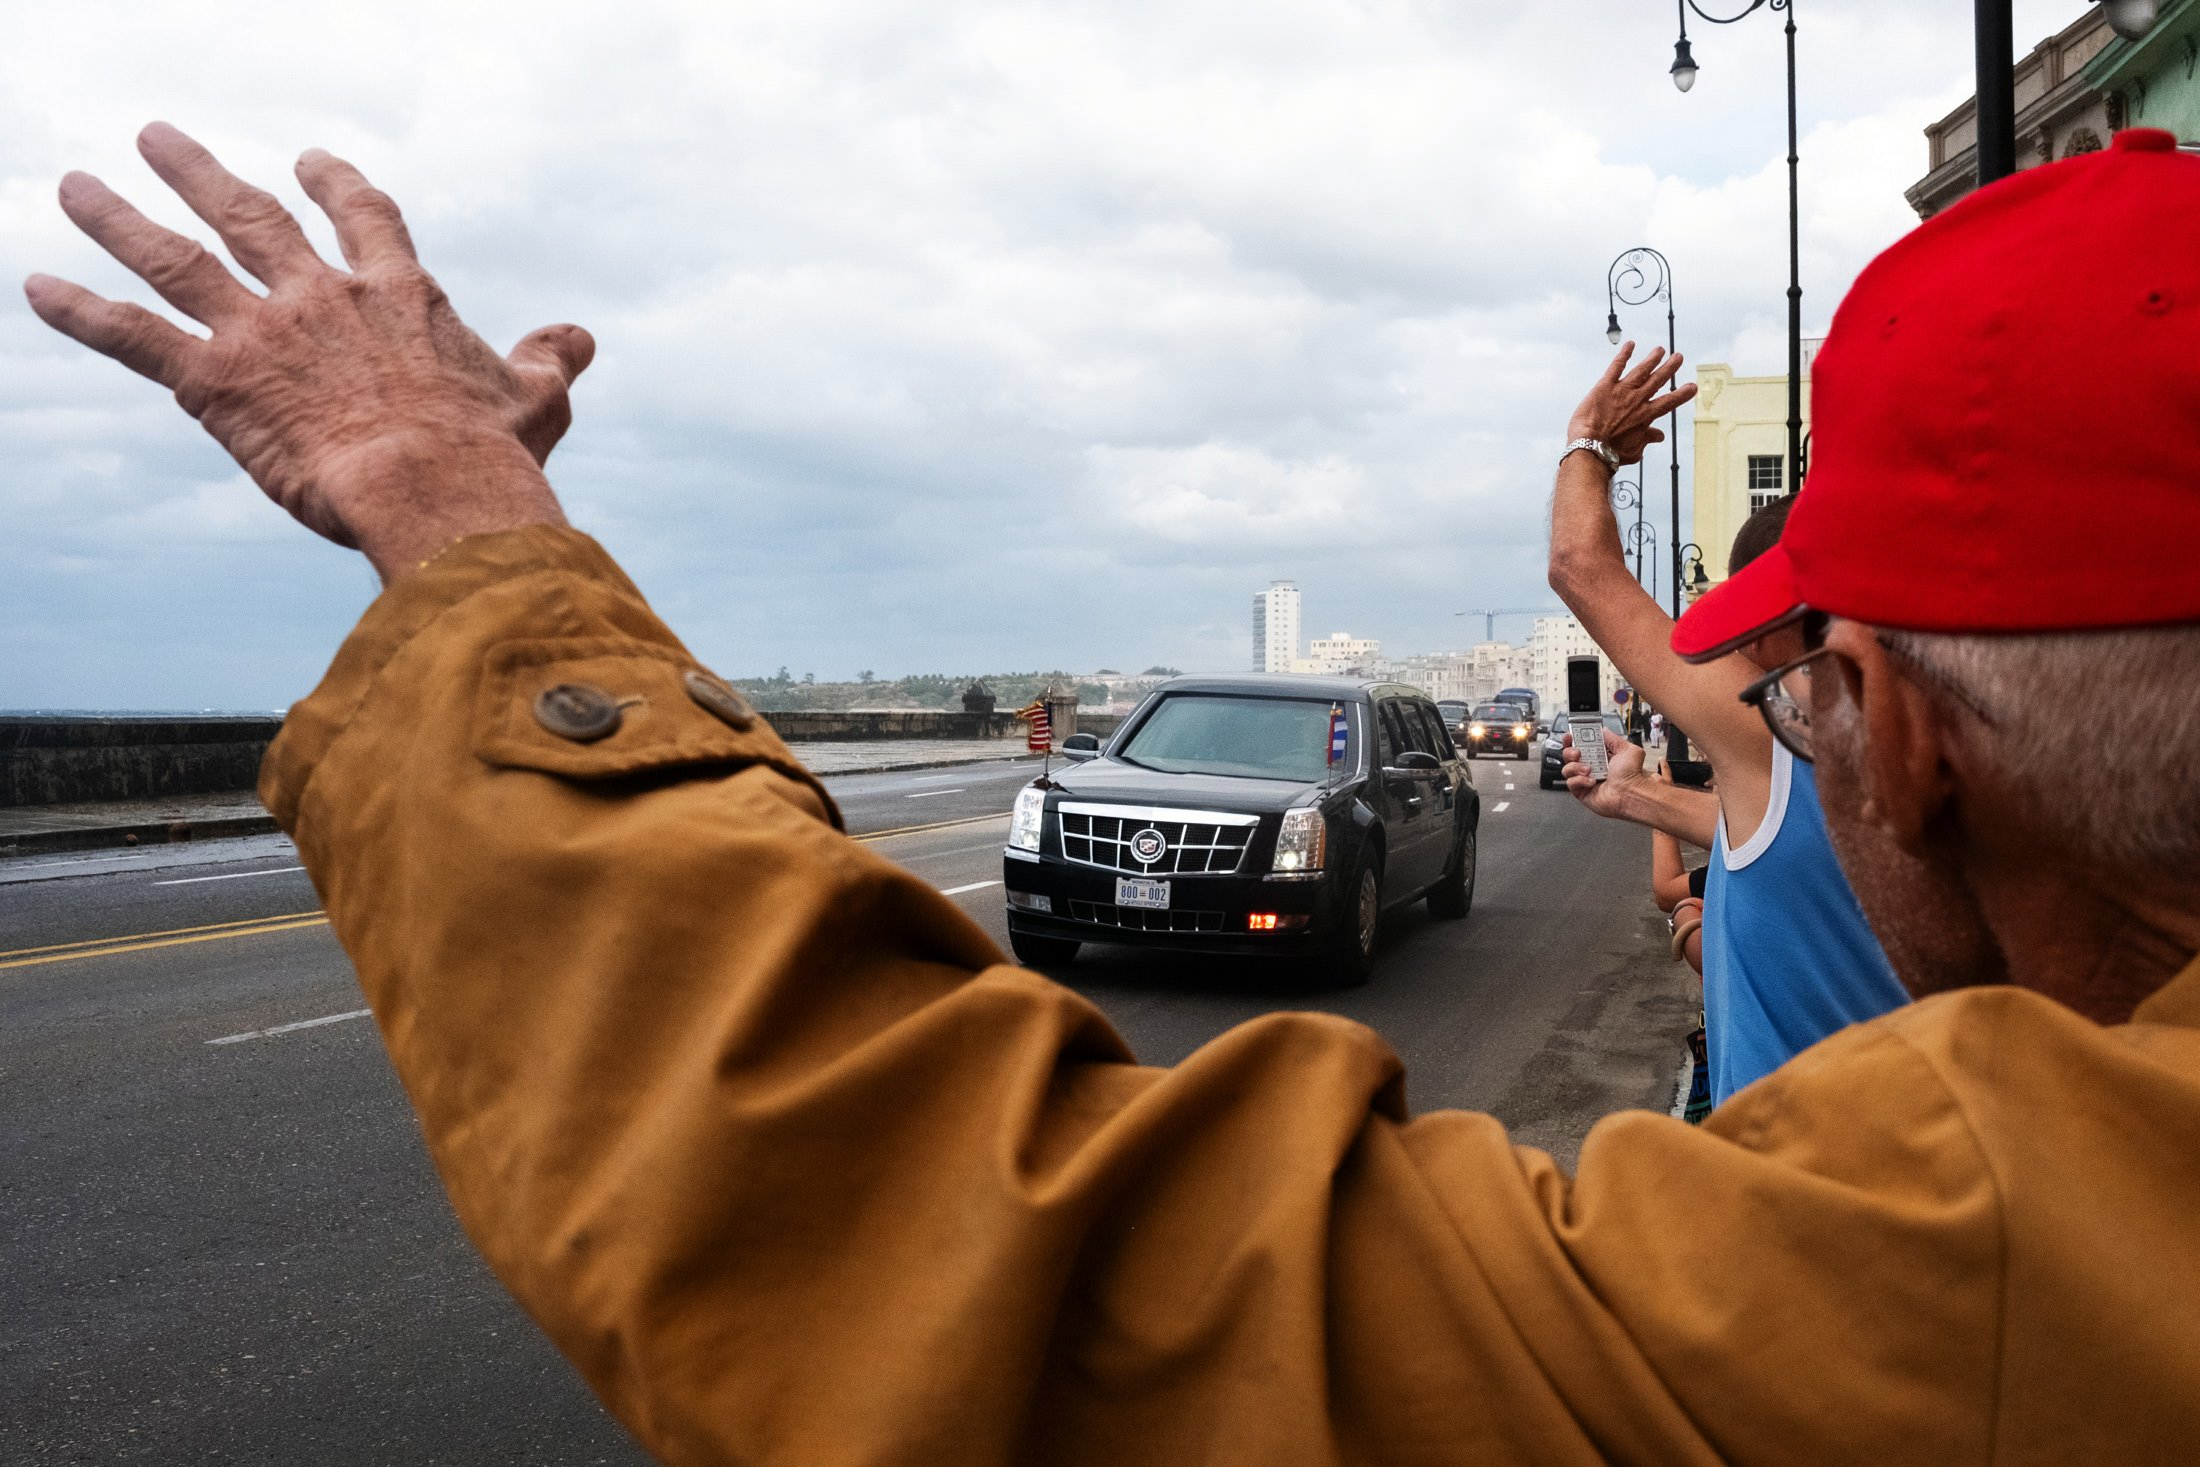 man waving at President Obama's car